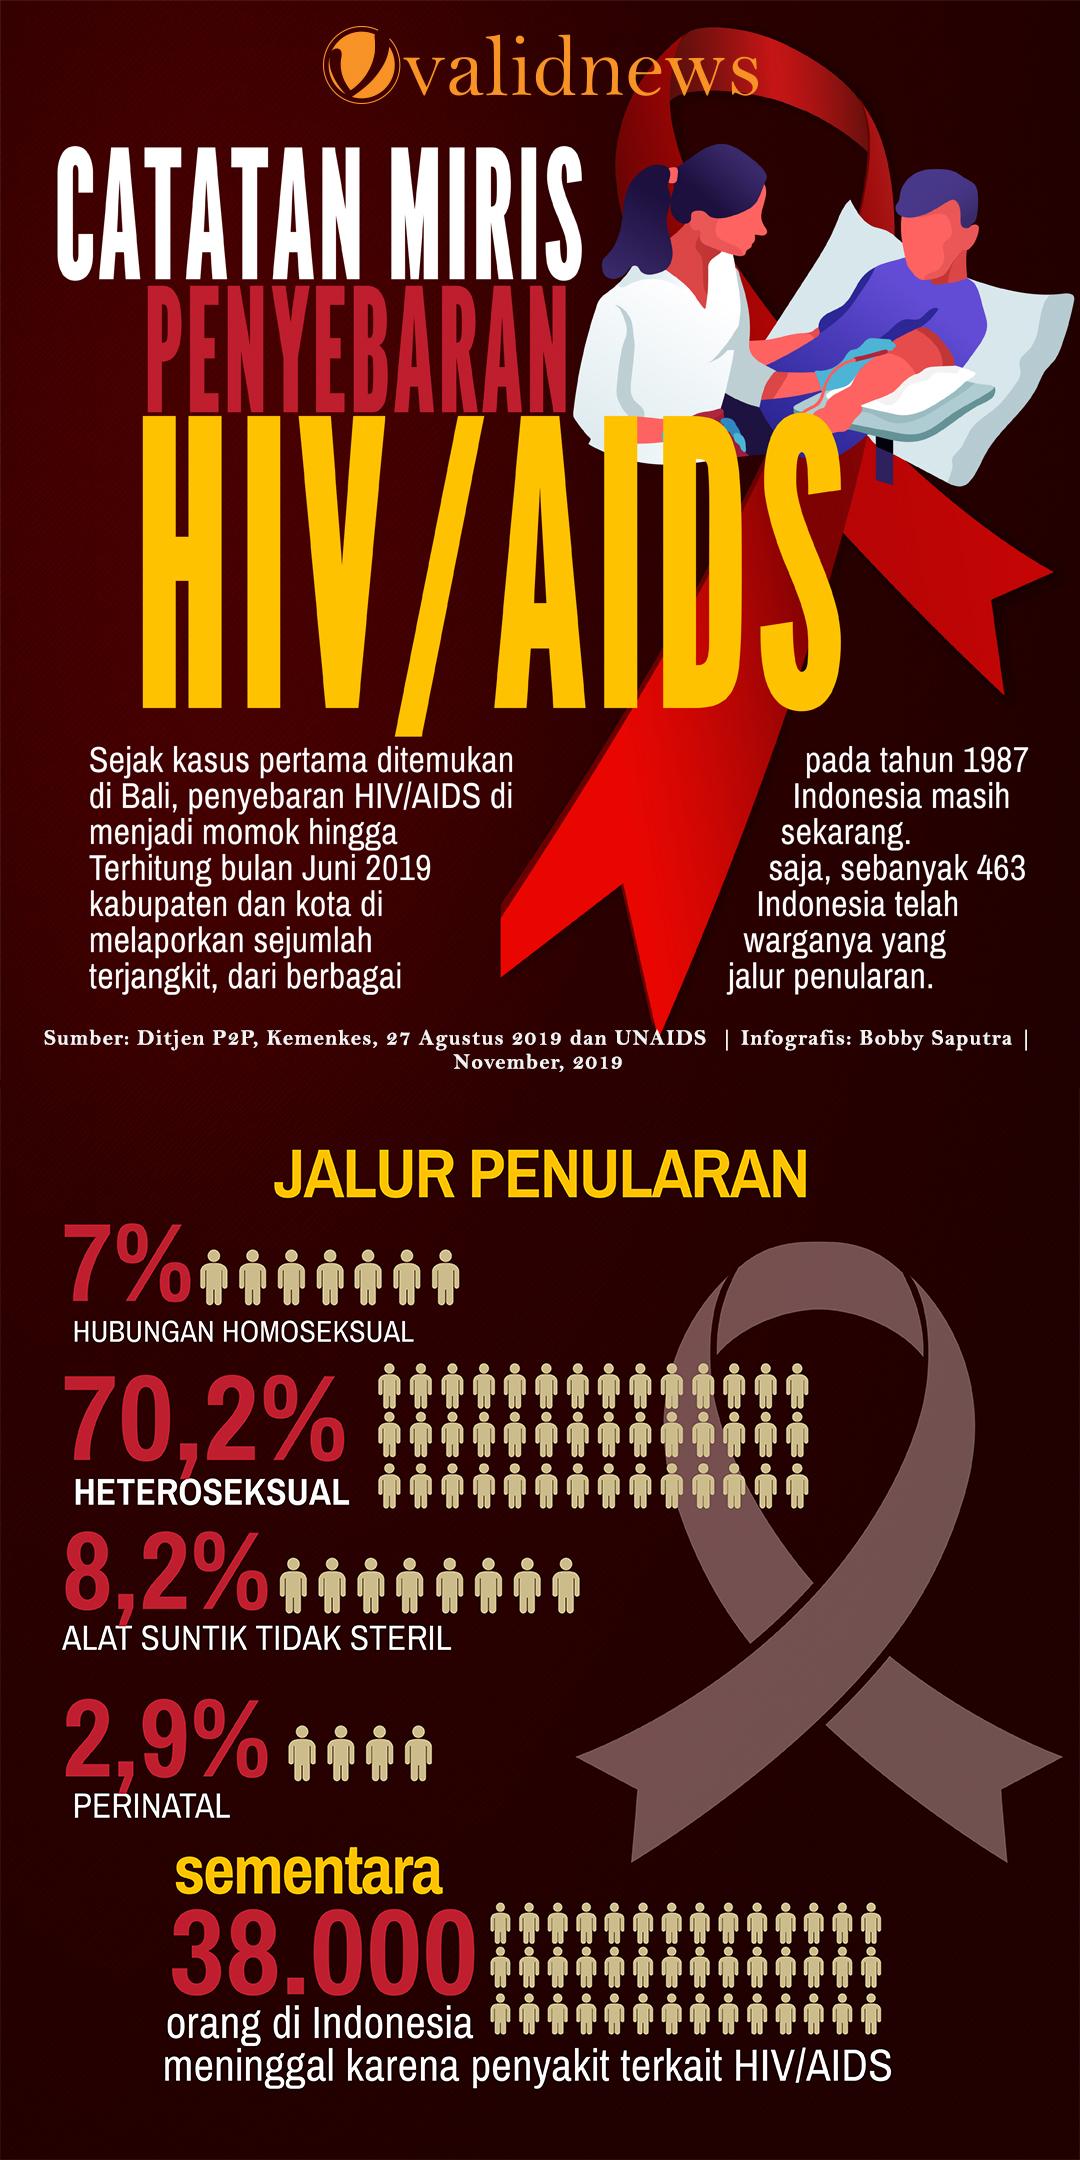 Ingat!  Ancaman pembunuhan HIV-AIDS di Indonesia masih nyata